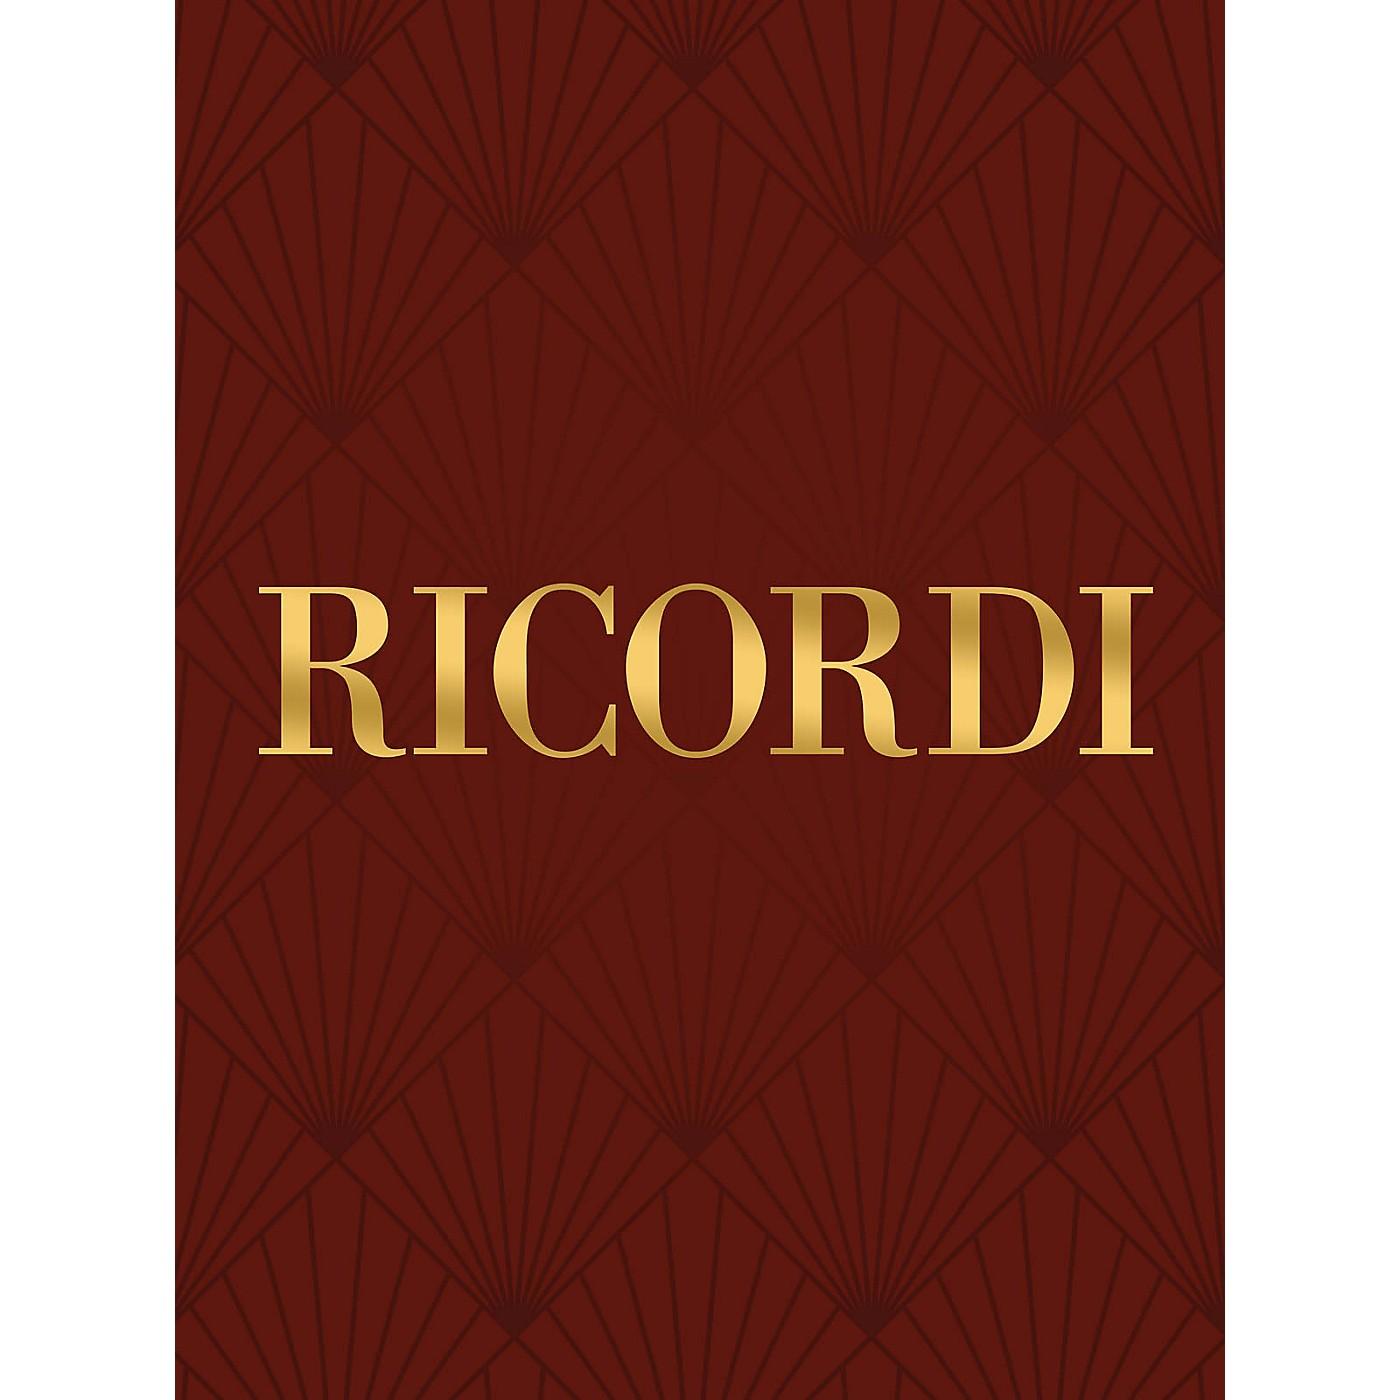 Ricordi Byrd, Morley, Tallis (Descant/treble/tenor recorders) Ricordi London Series thumbnail